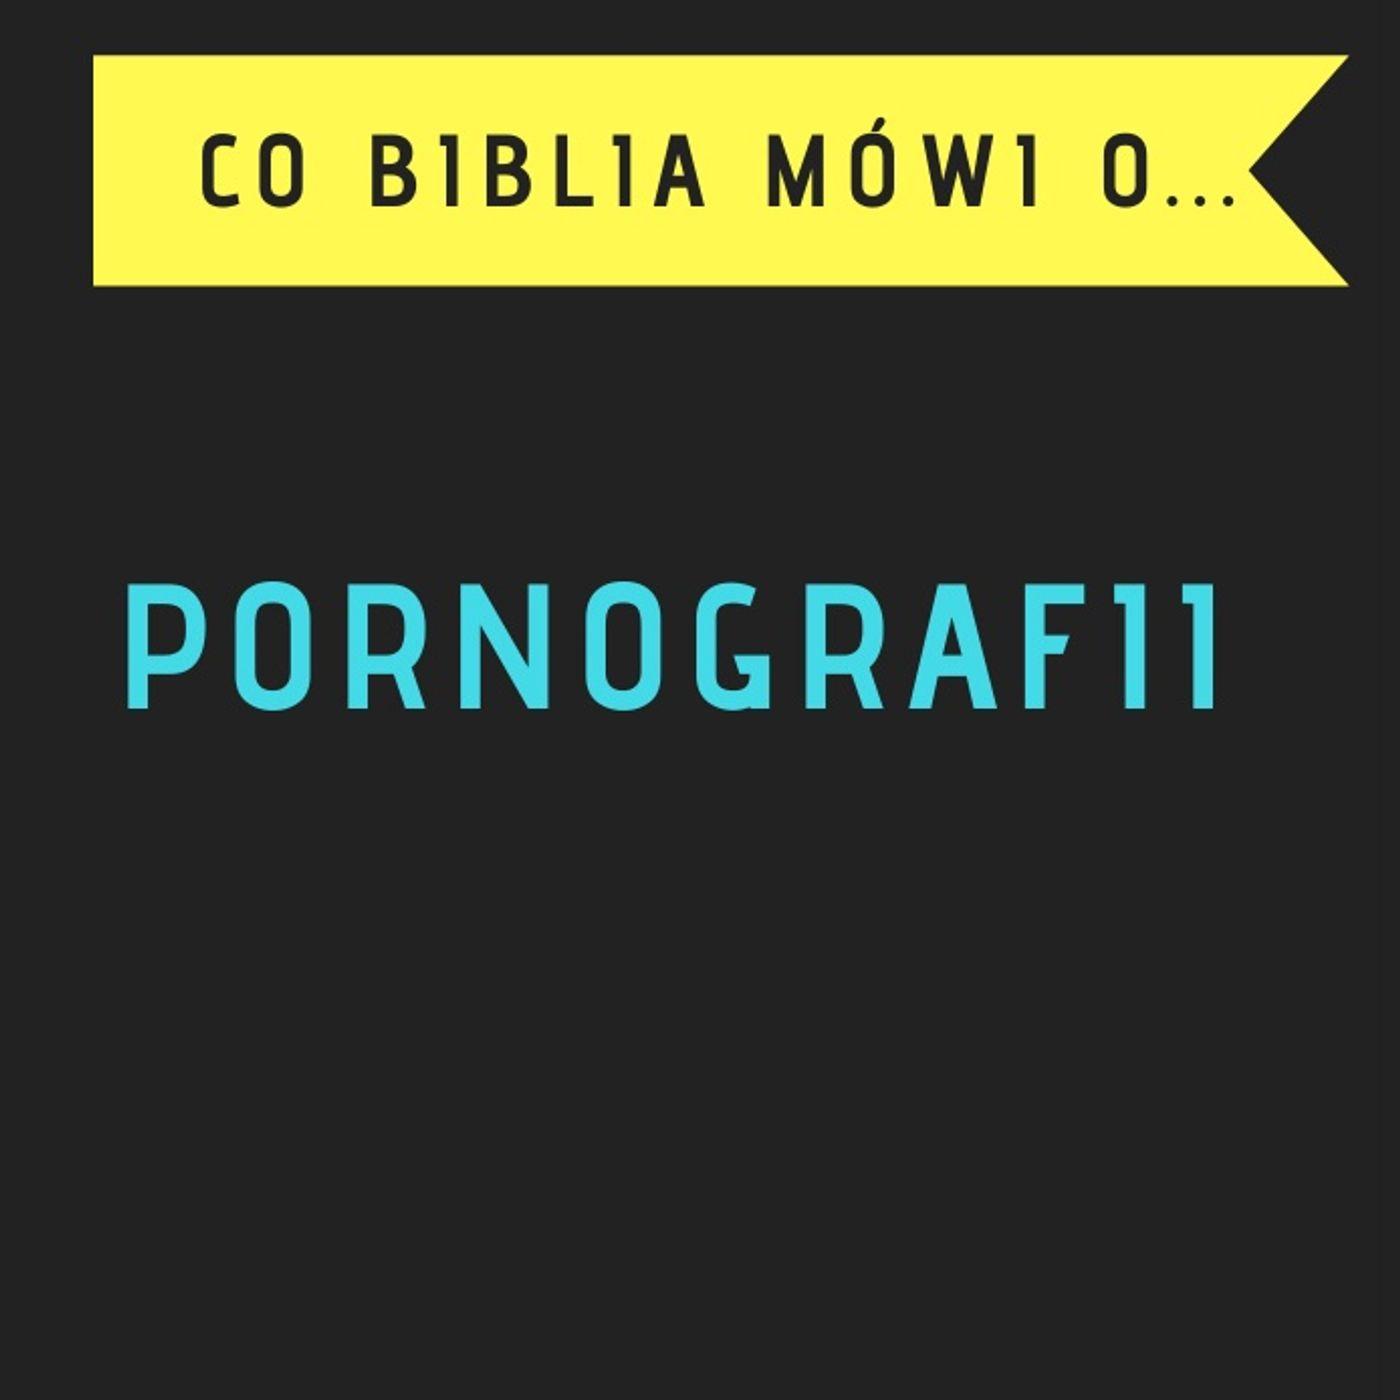 Co mowi Biblia o pornografii